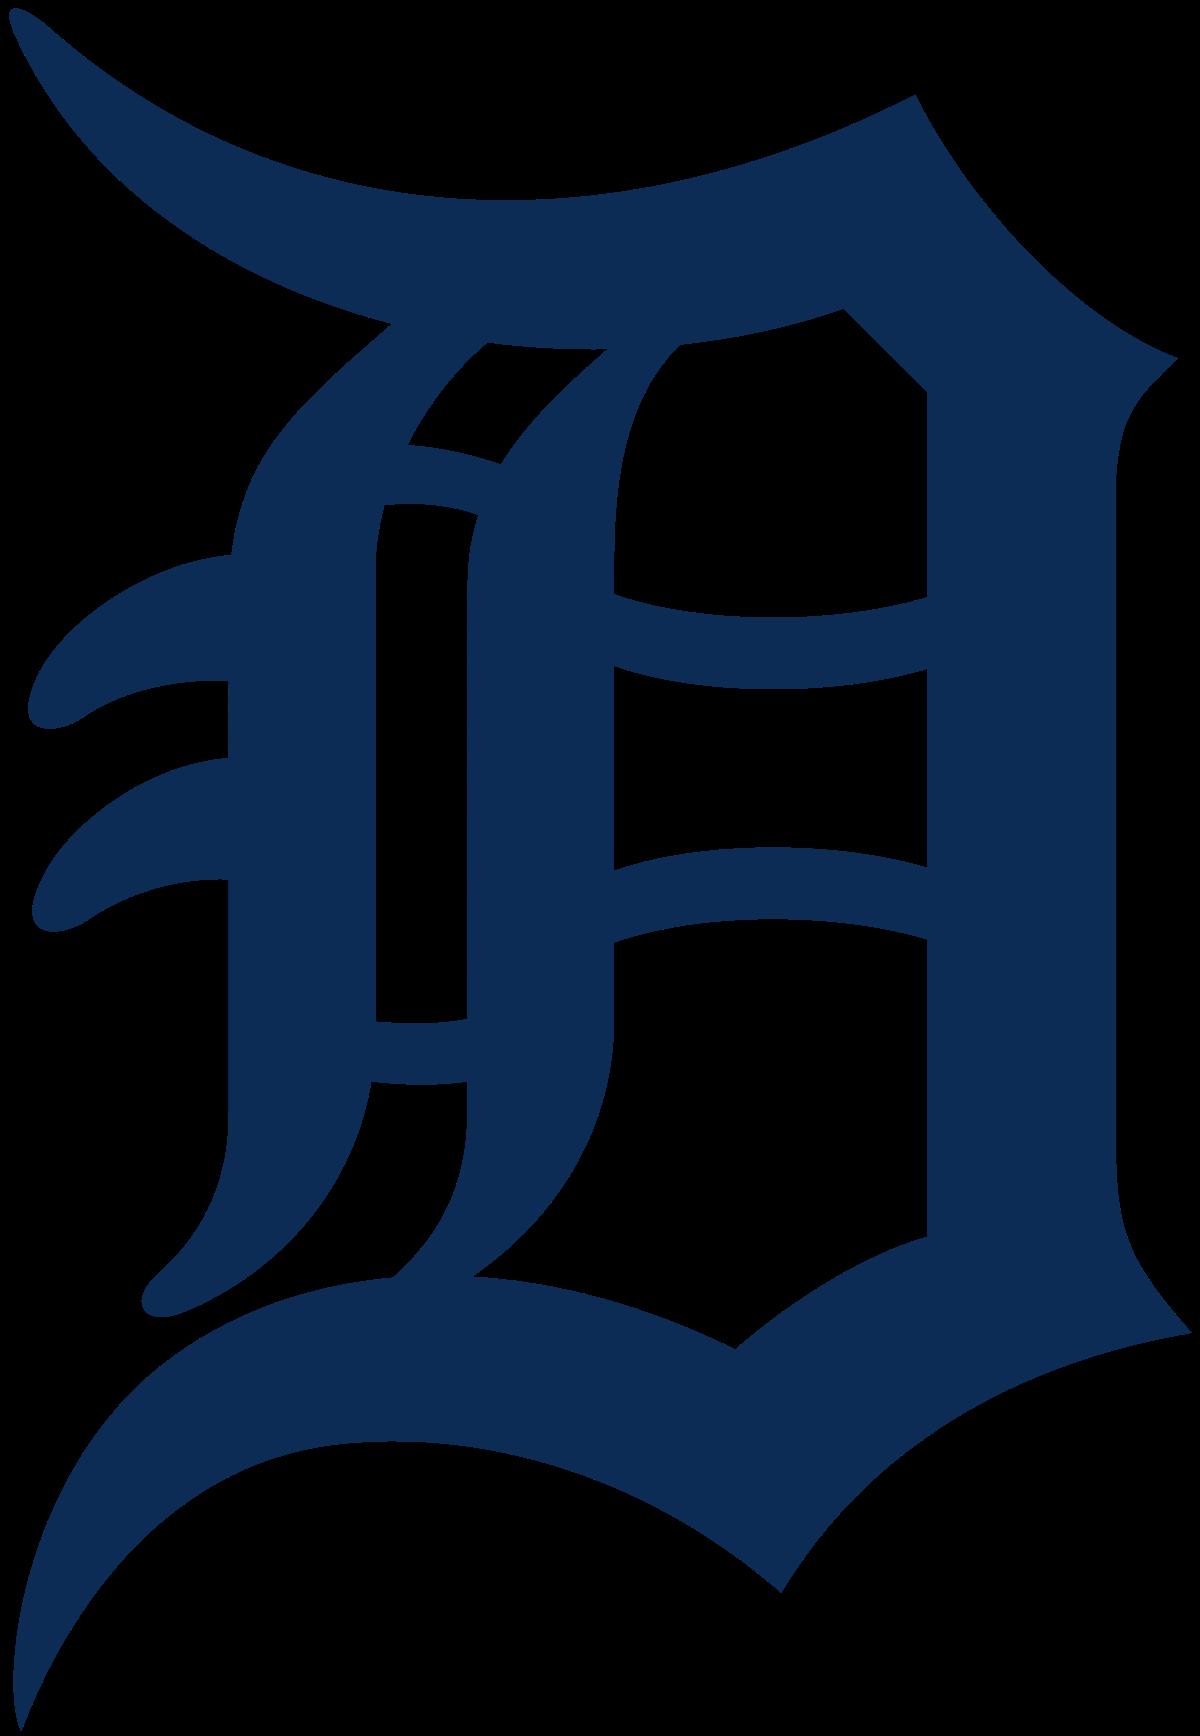 Free detroit tigers clipart clip 2019 Detroit Tigers season - Wikipedia clip